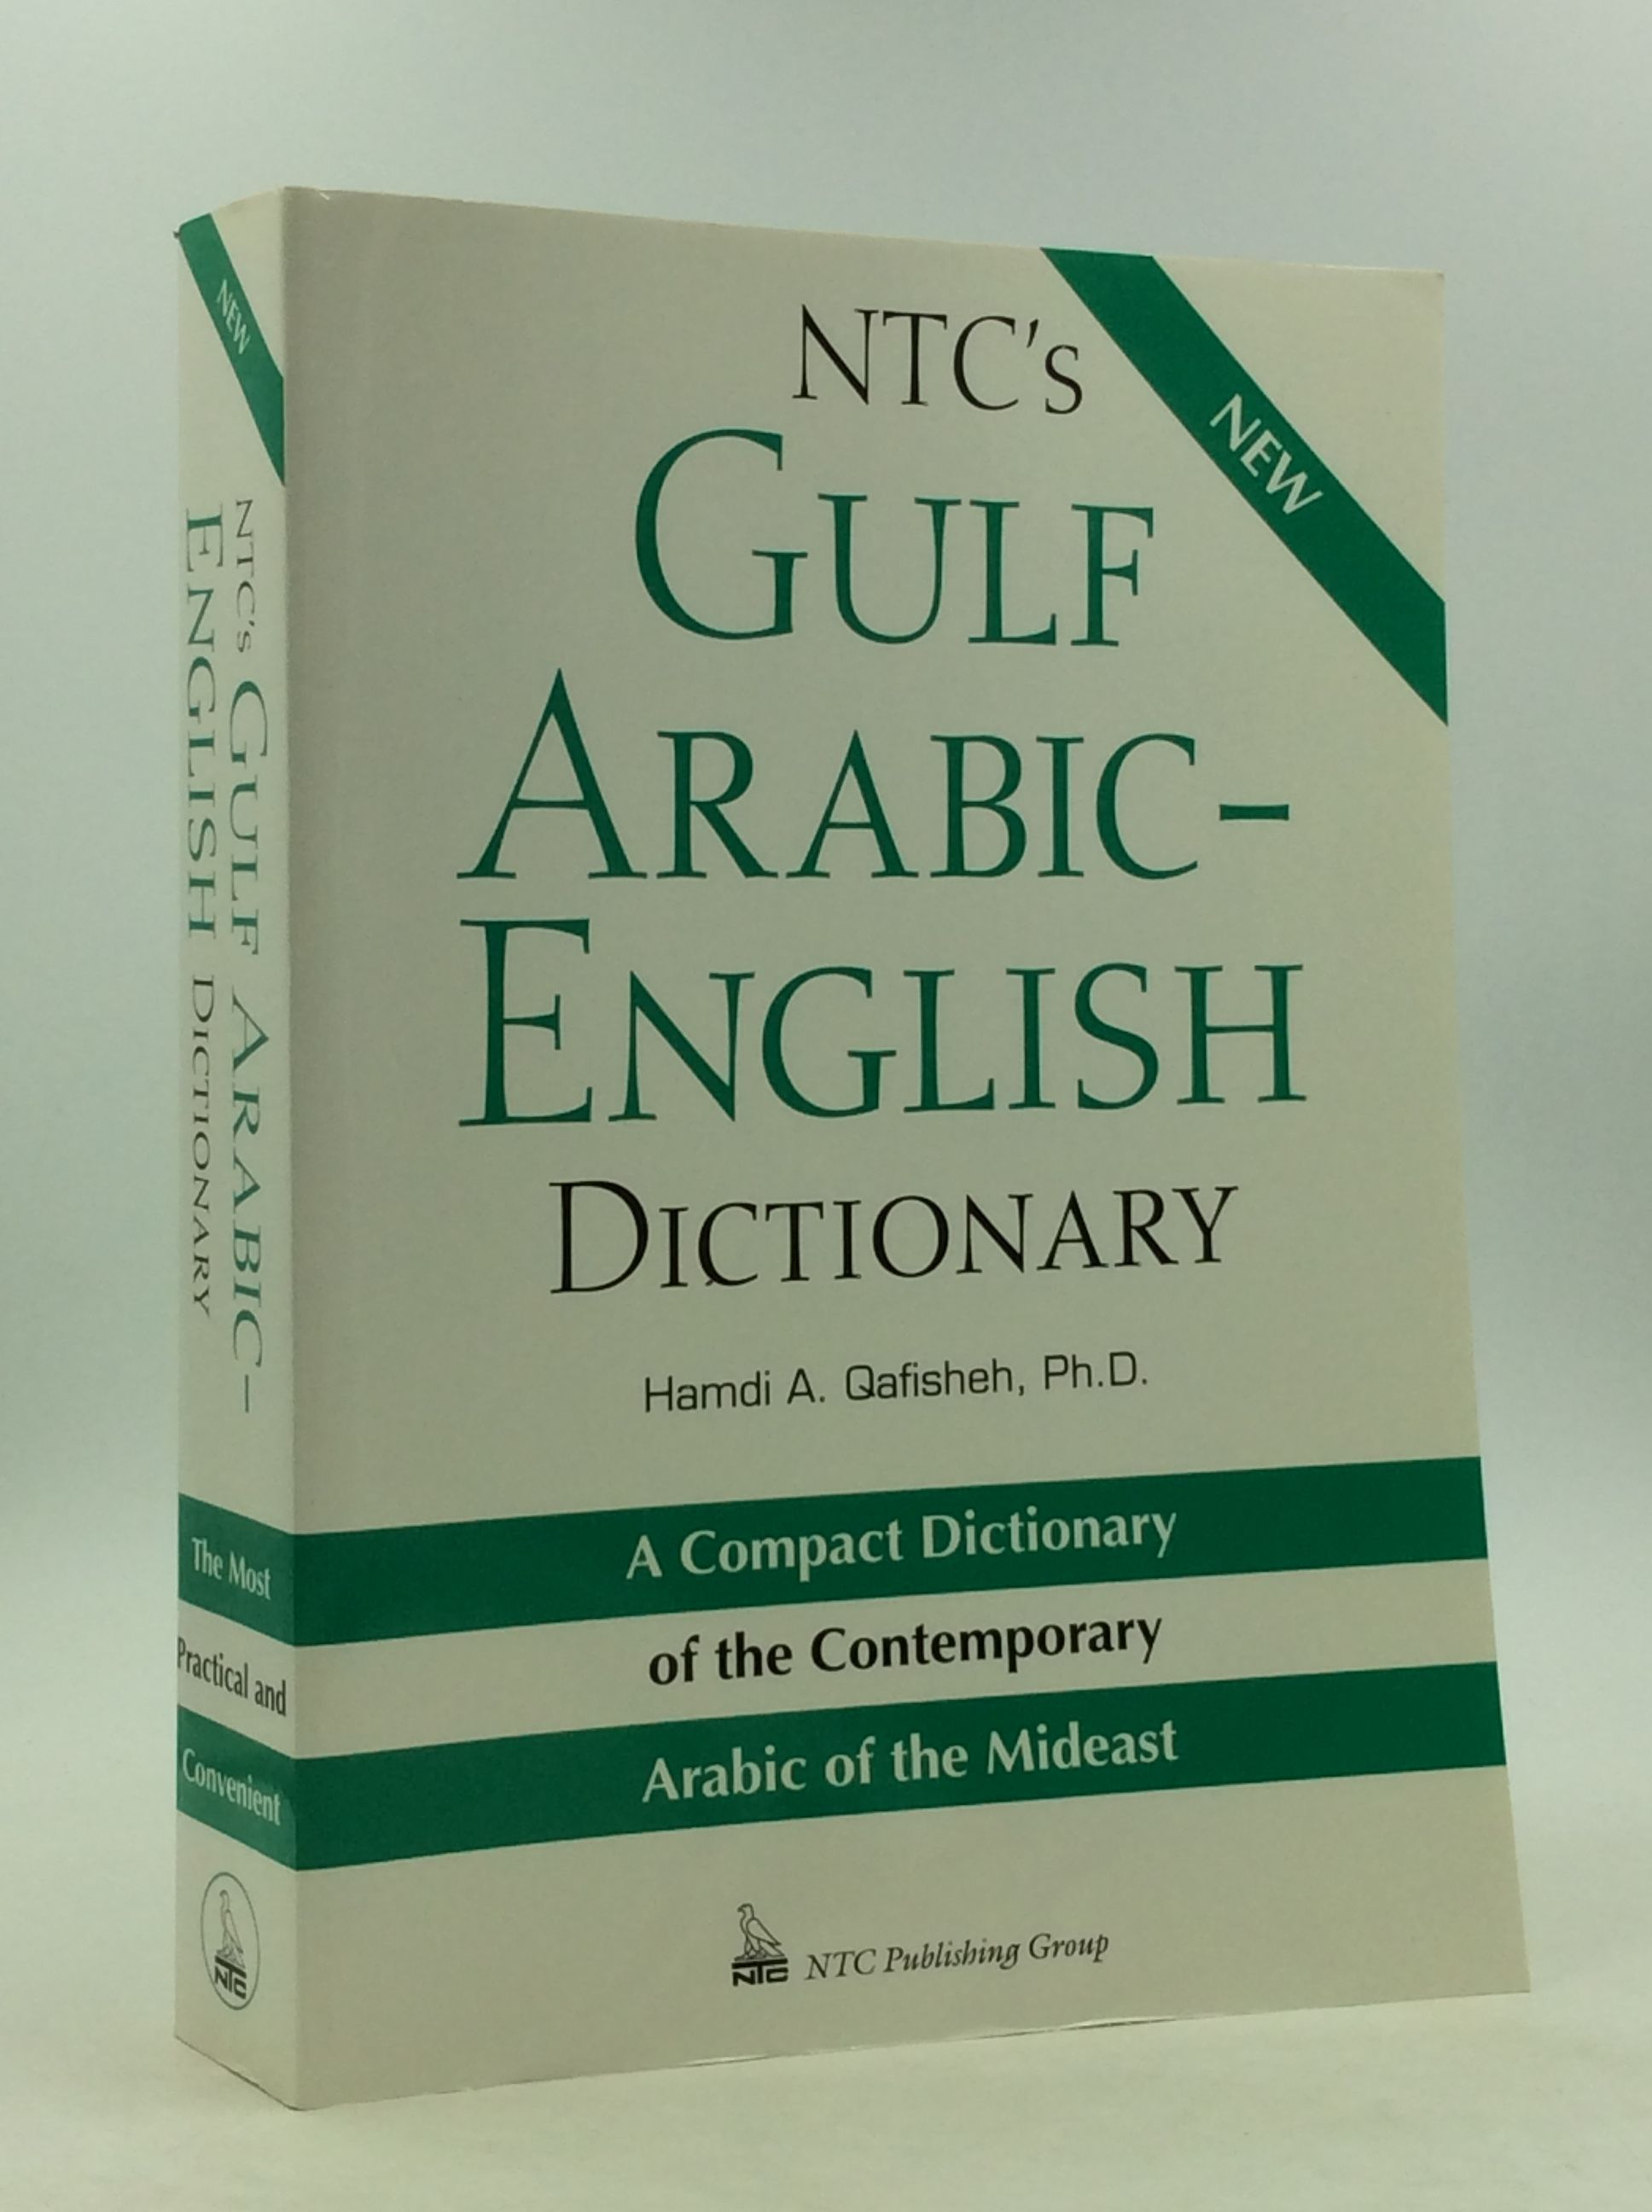 9780844202990 - NTC's Gulf Arabic-English Dictionary by